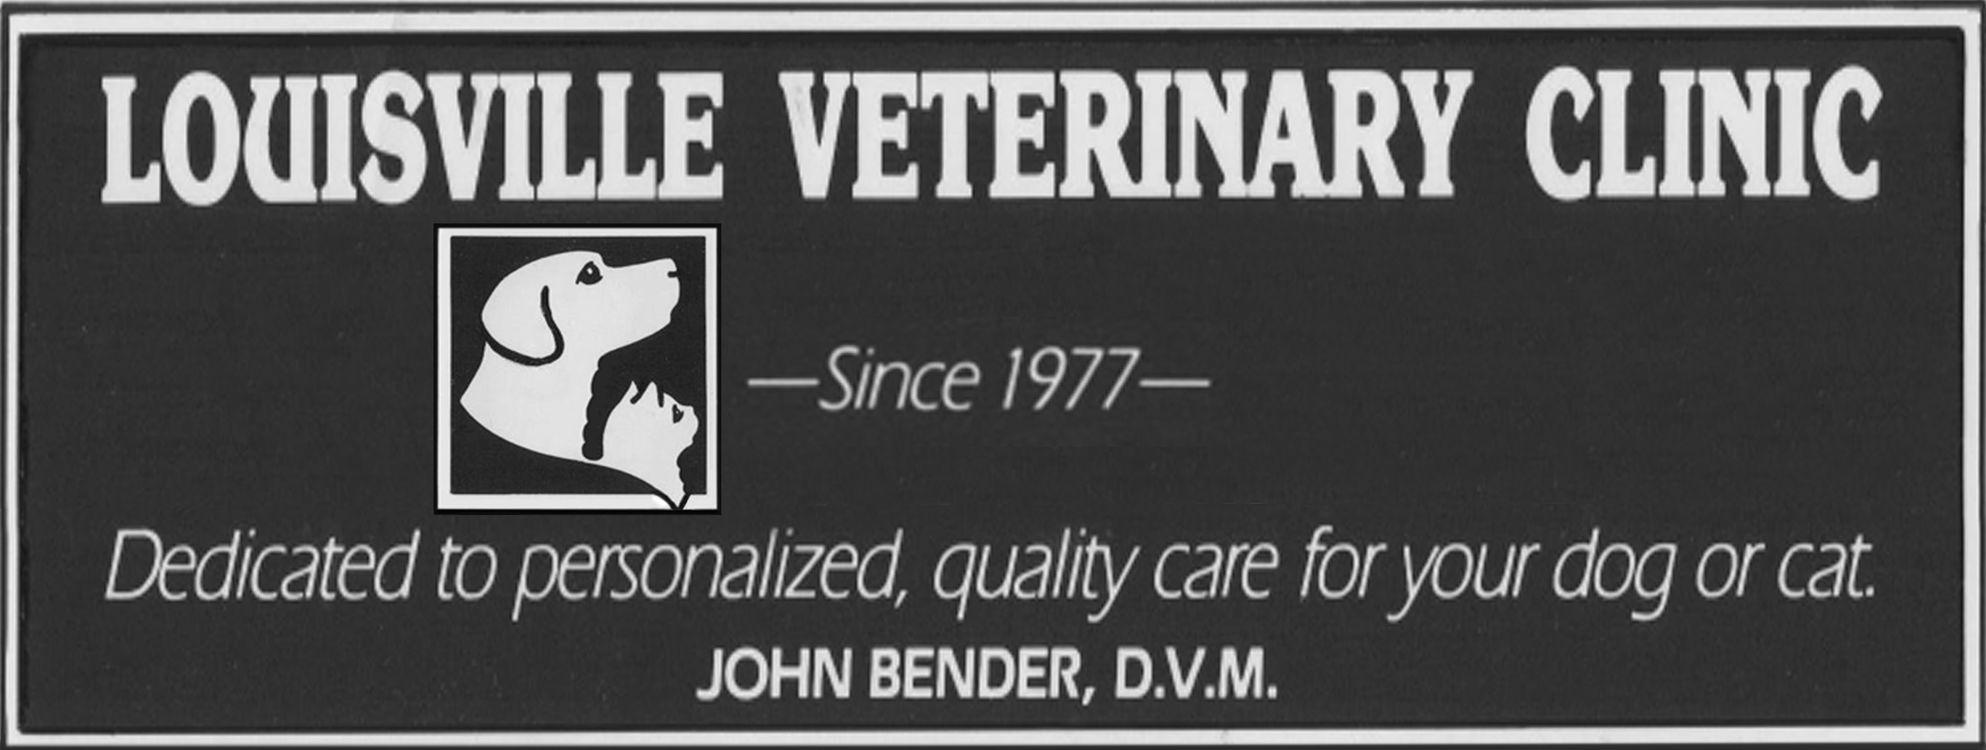 Louisville Veterinary Clinic